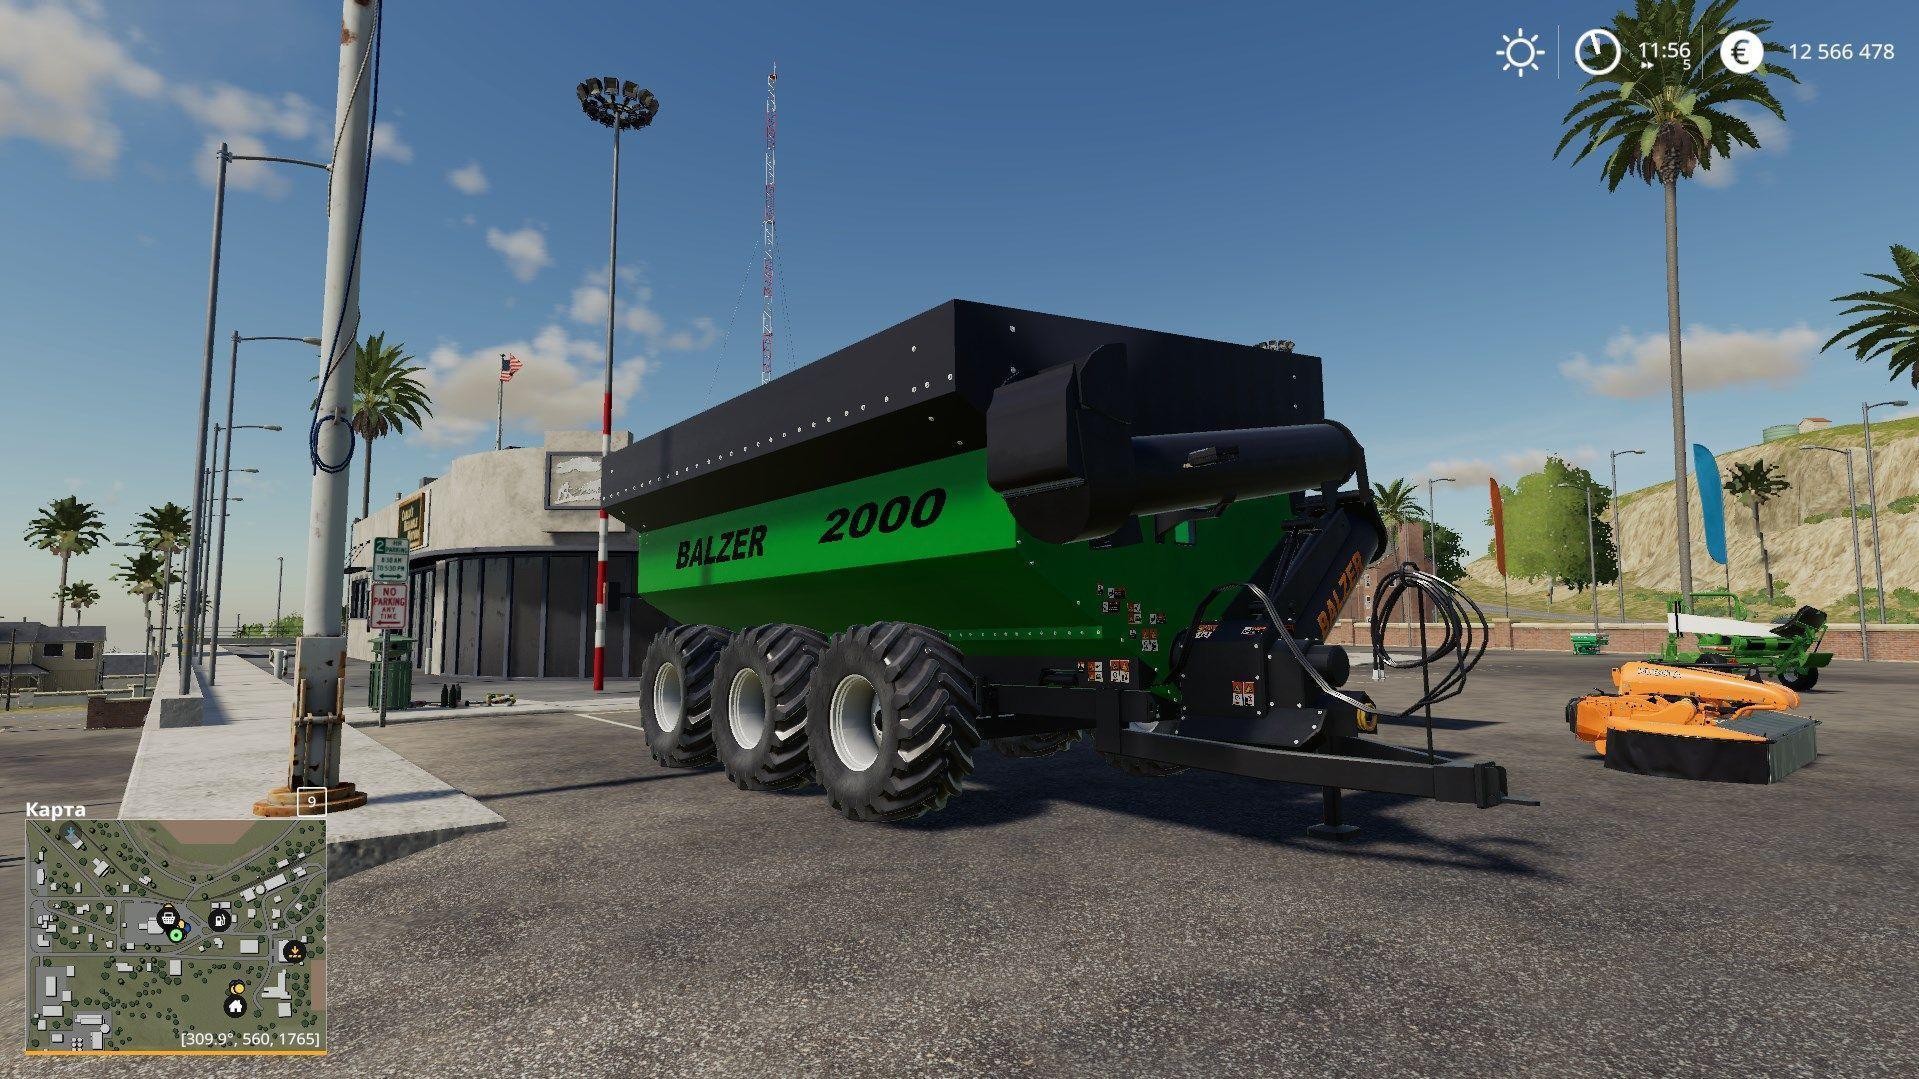 BALZER 2000 GRAIN CART v1 0 FS19 - Farming Simulator 19 Mod